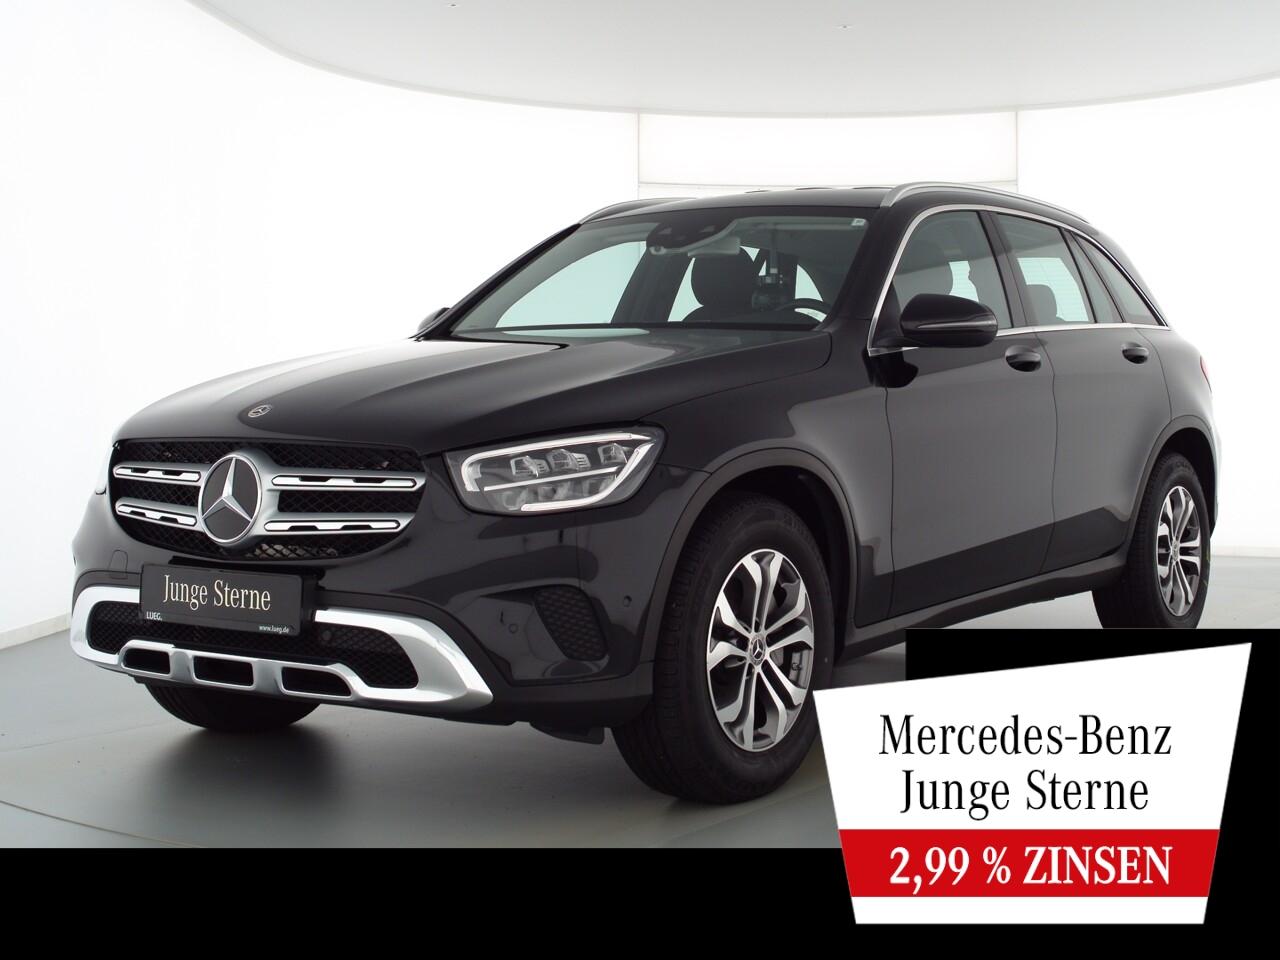 Mercedes-Benz GLC 200 d 4M MBUX+LED-HP+AHK+Distr+SpurPk+Kamera, Jahr 2020, Diesel